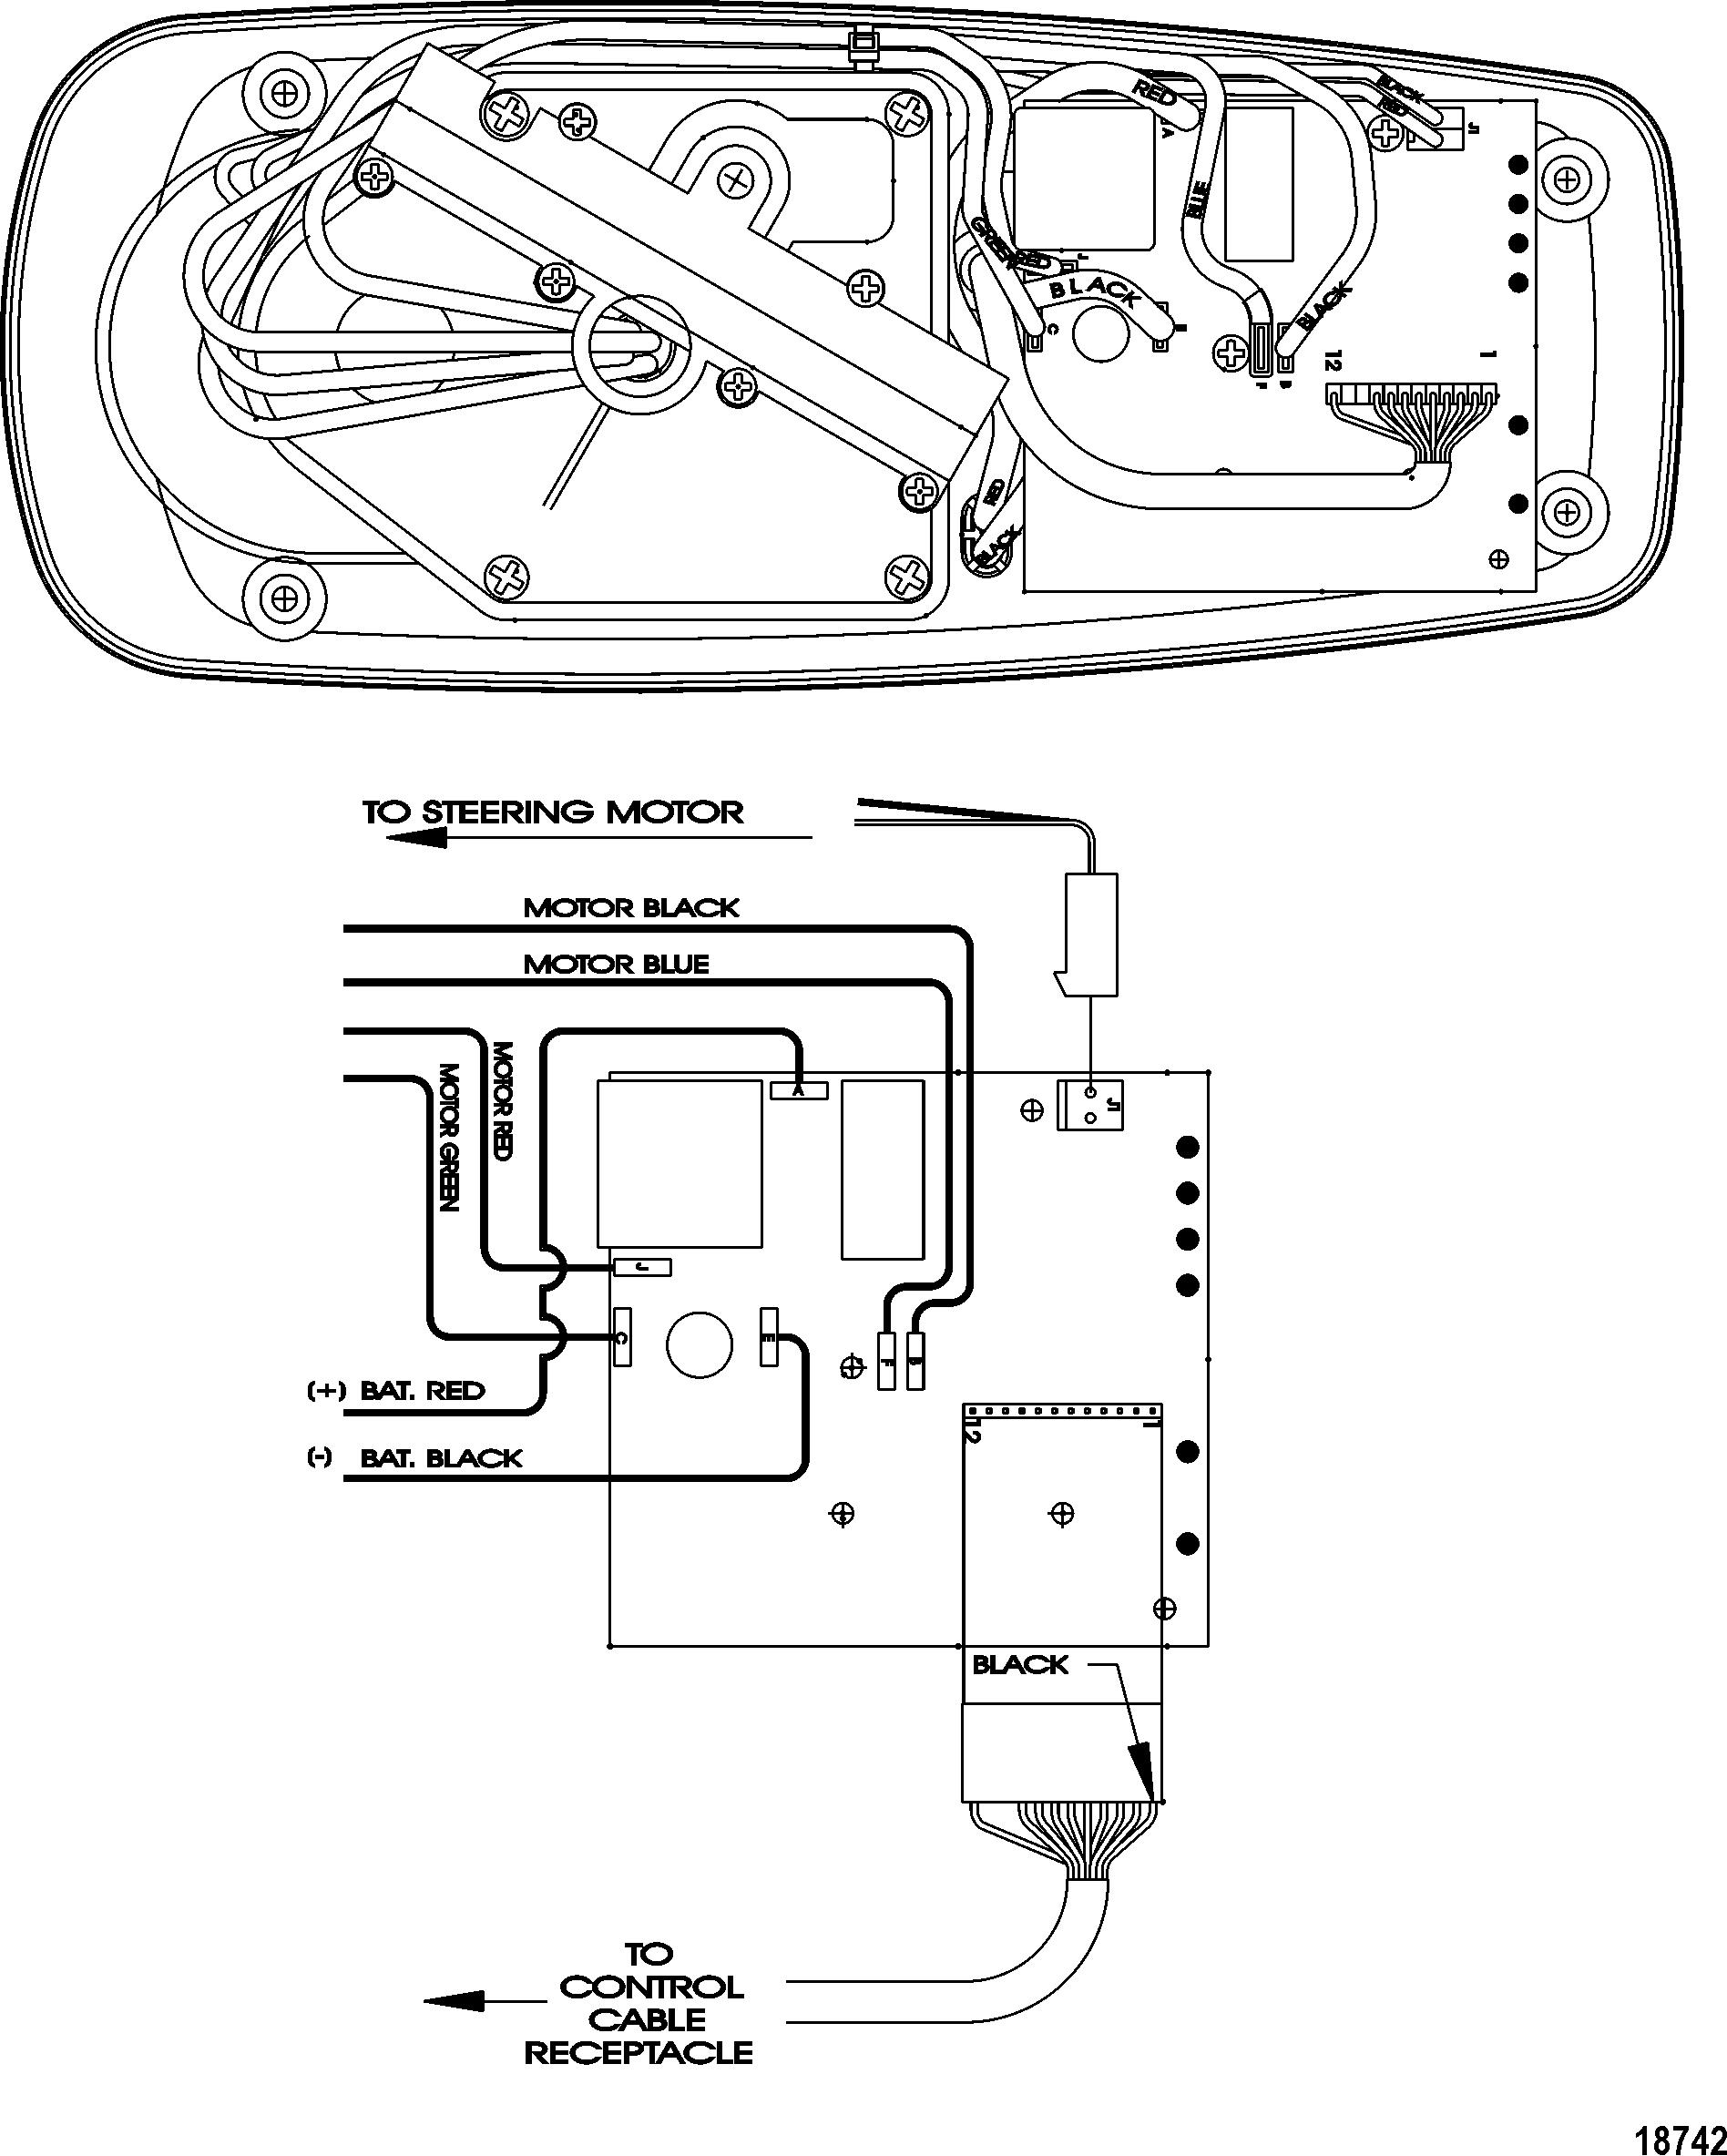 Motorguide Wiring Diagram